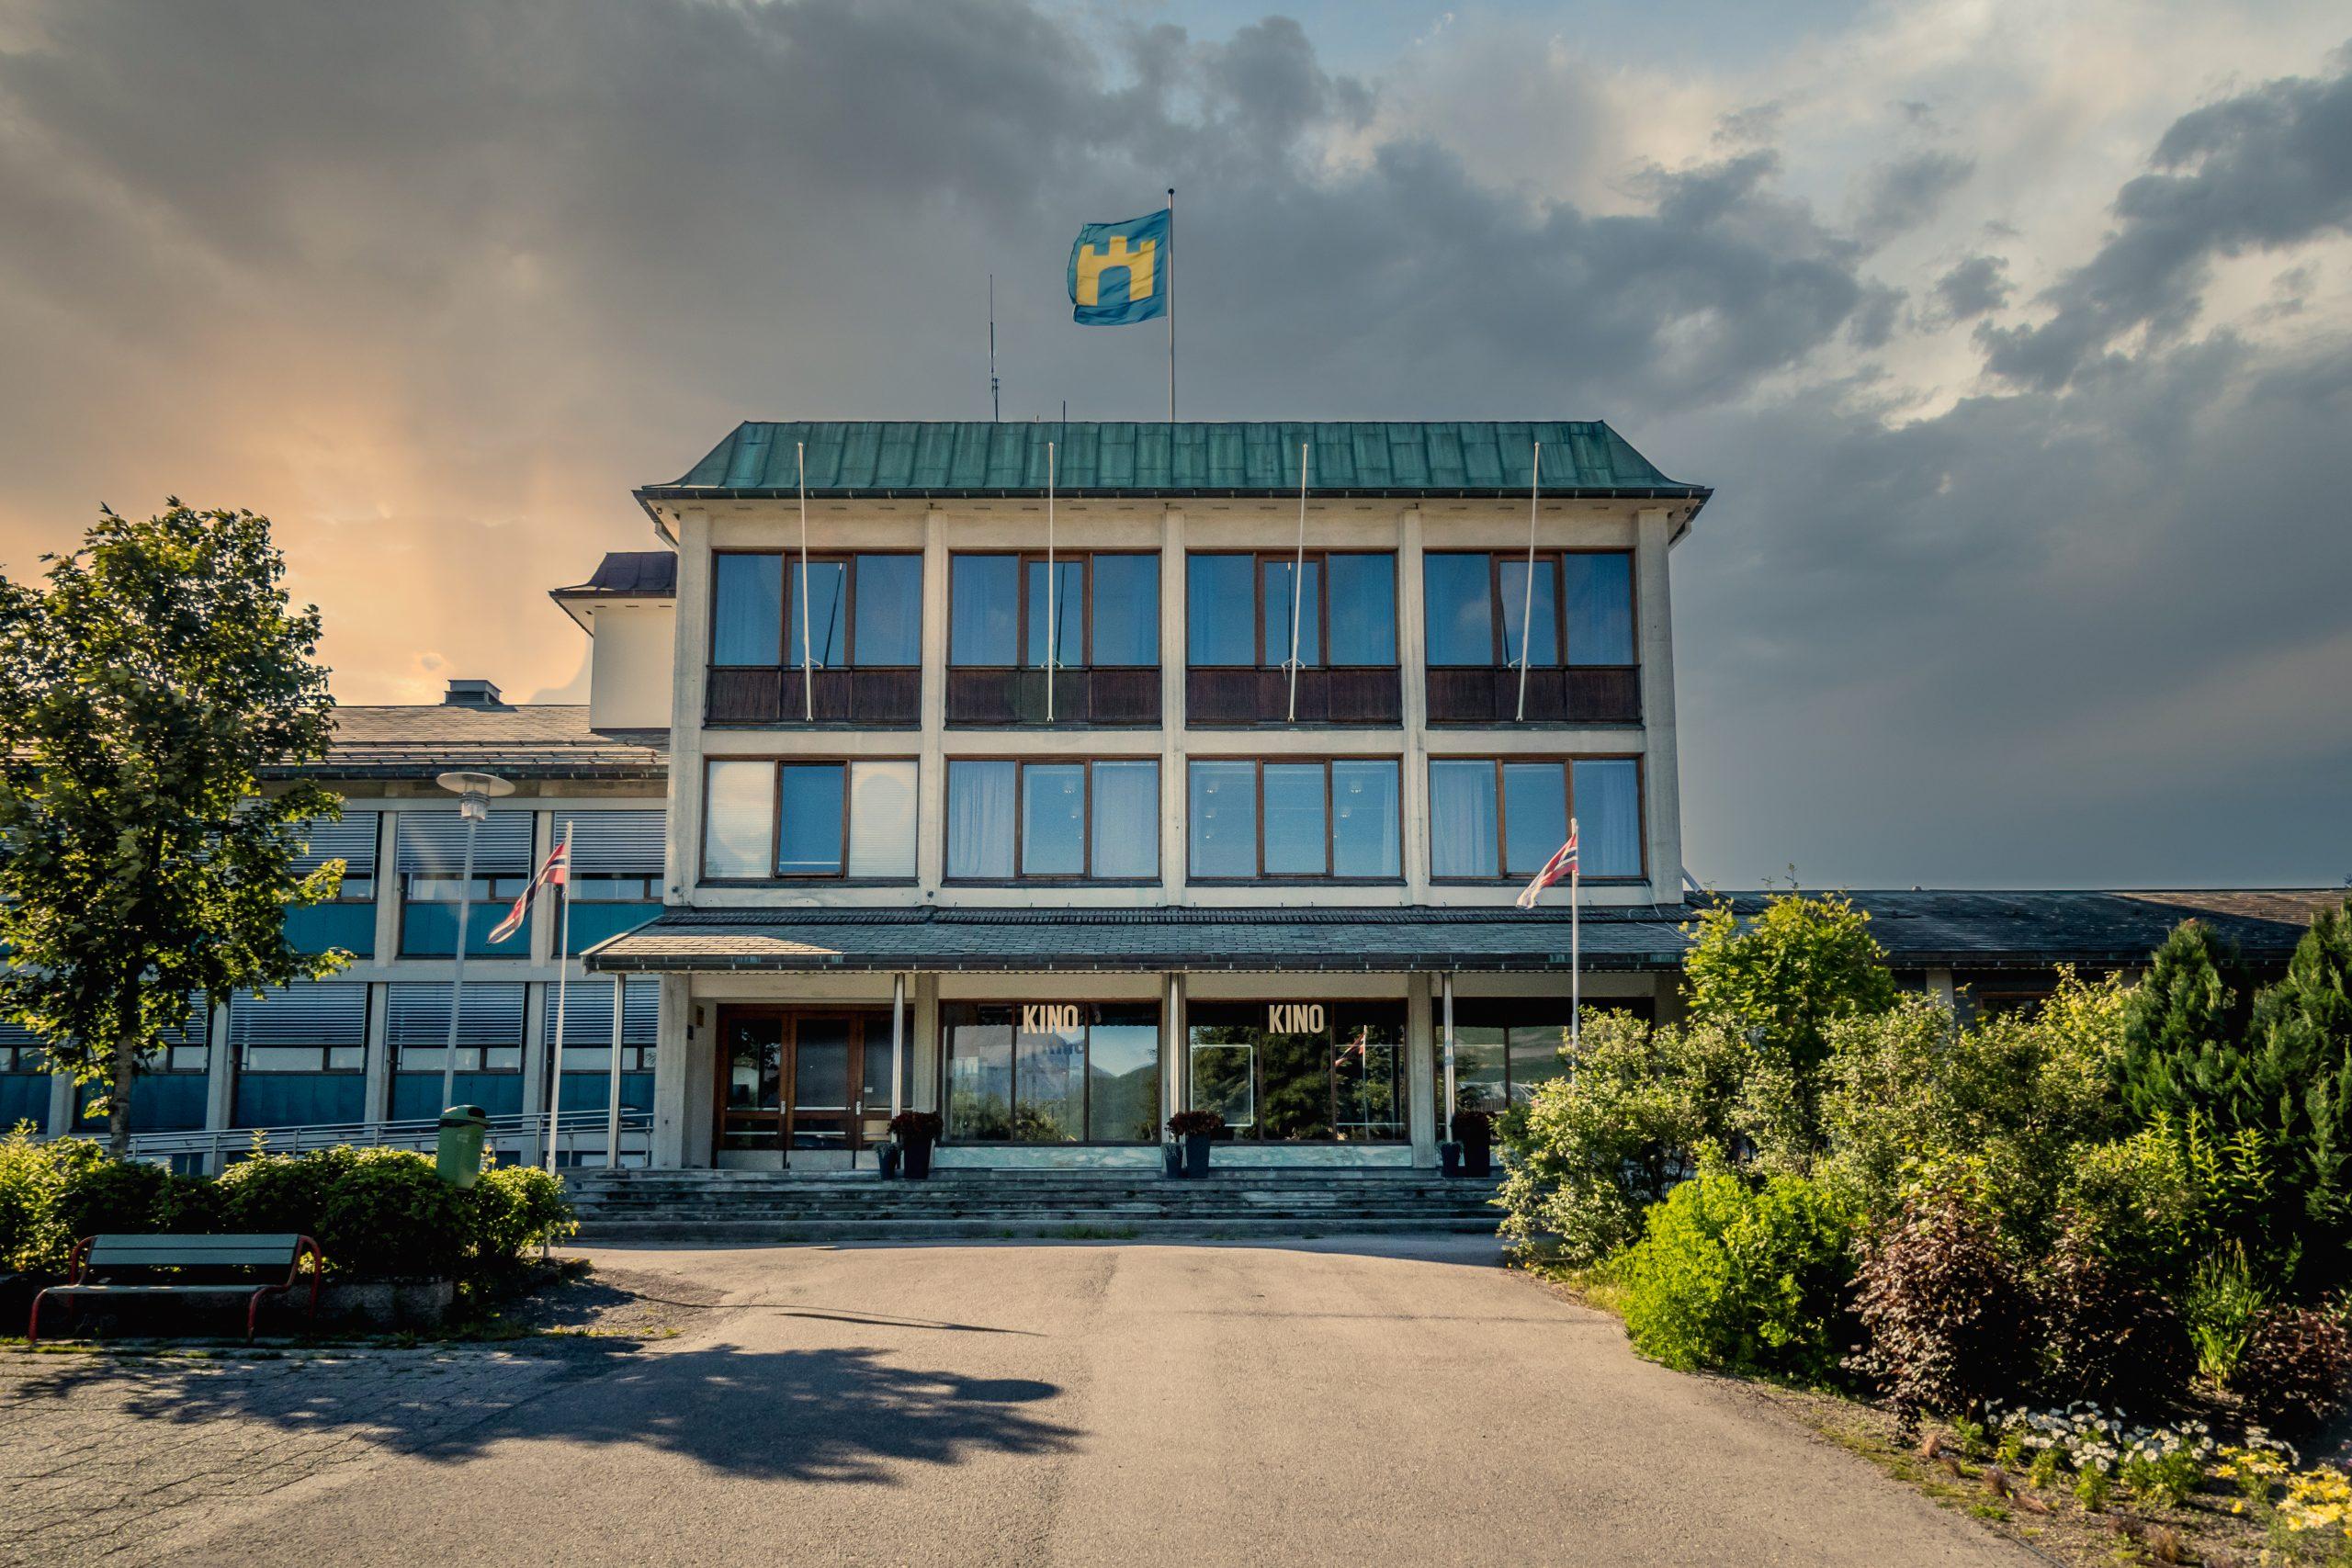 Sortland rådhus